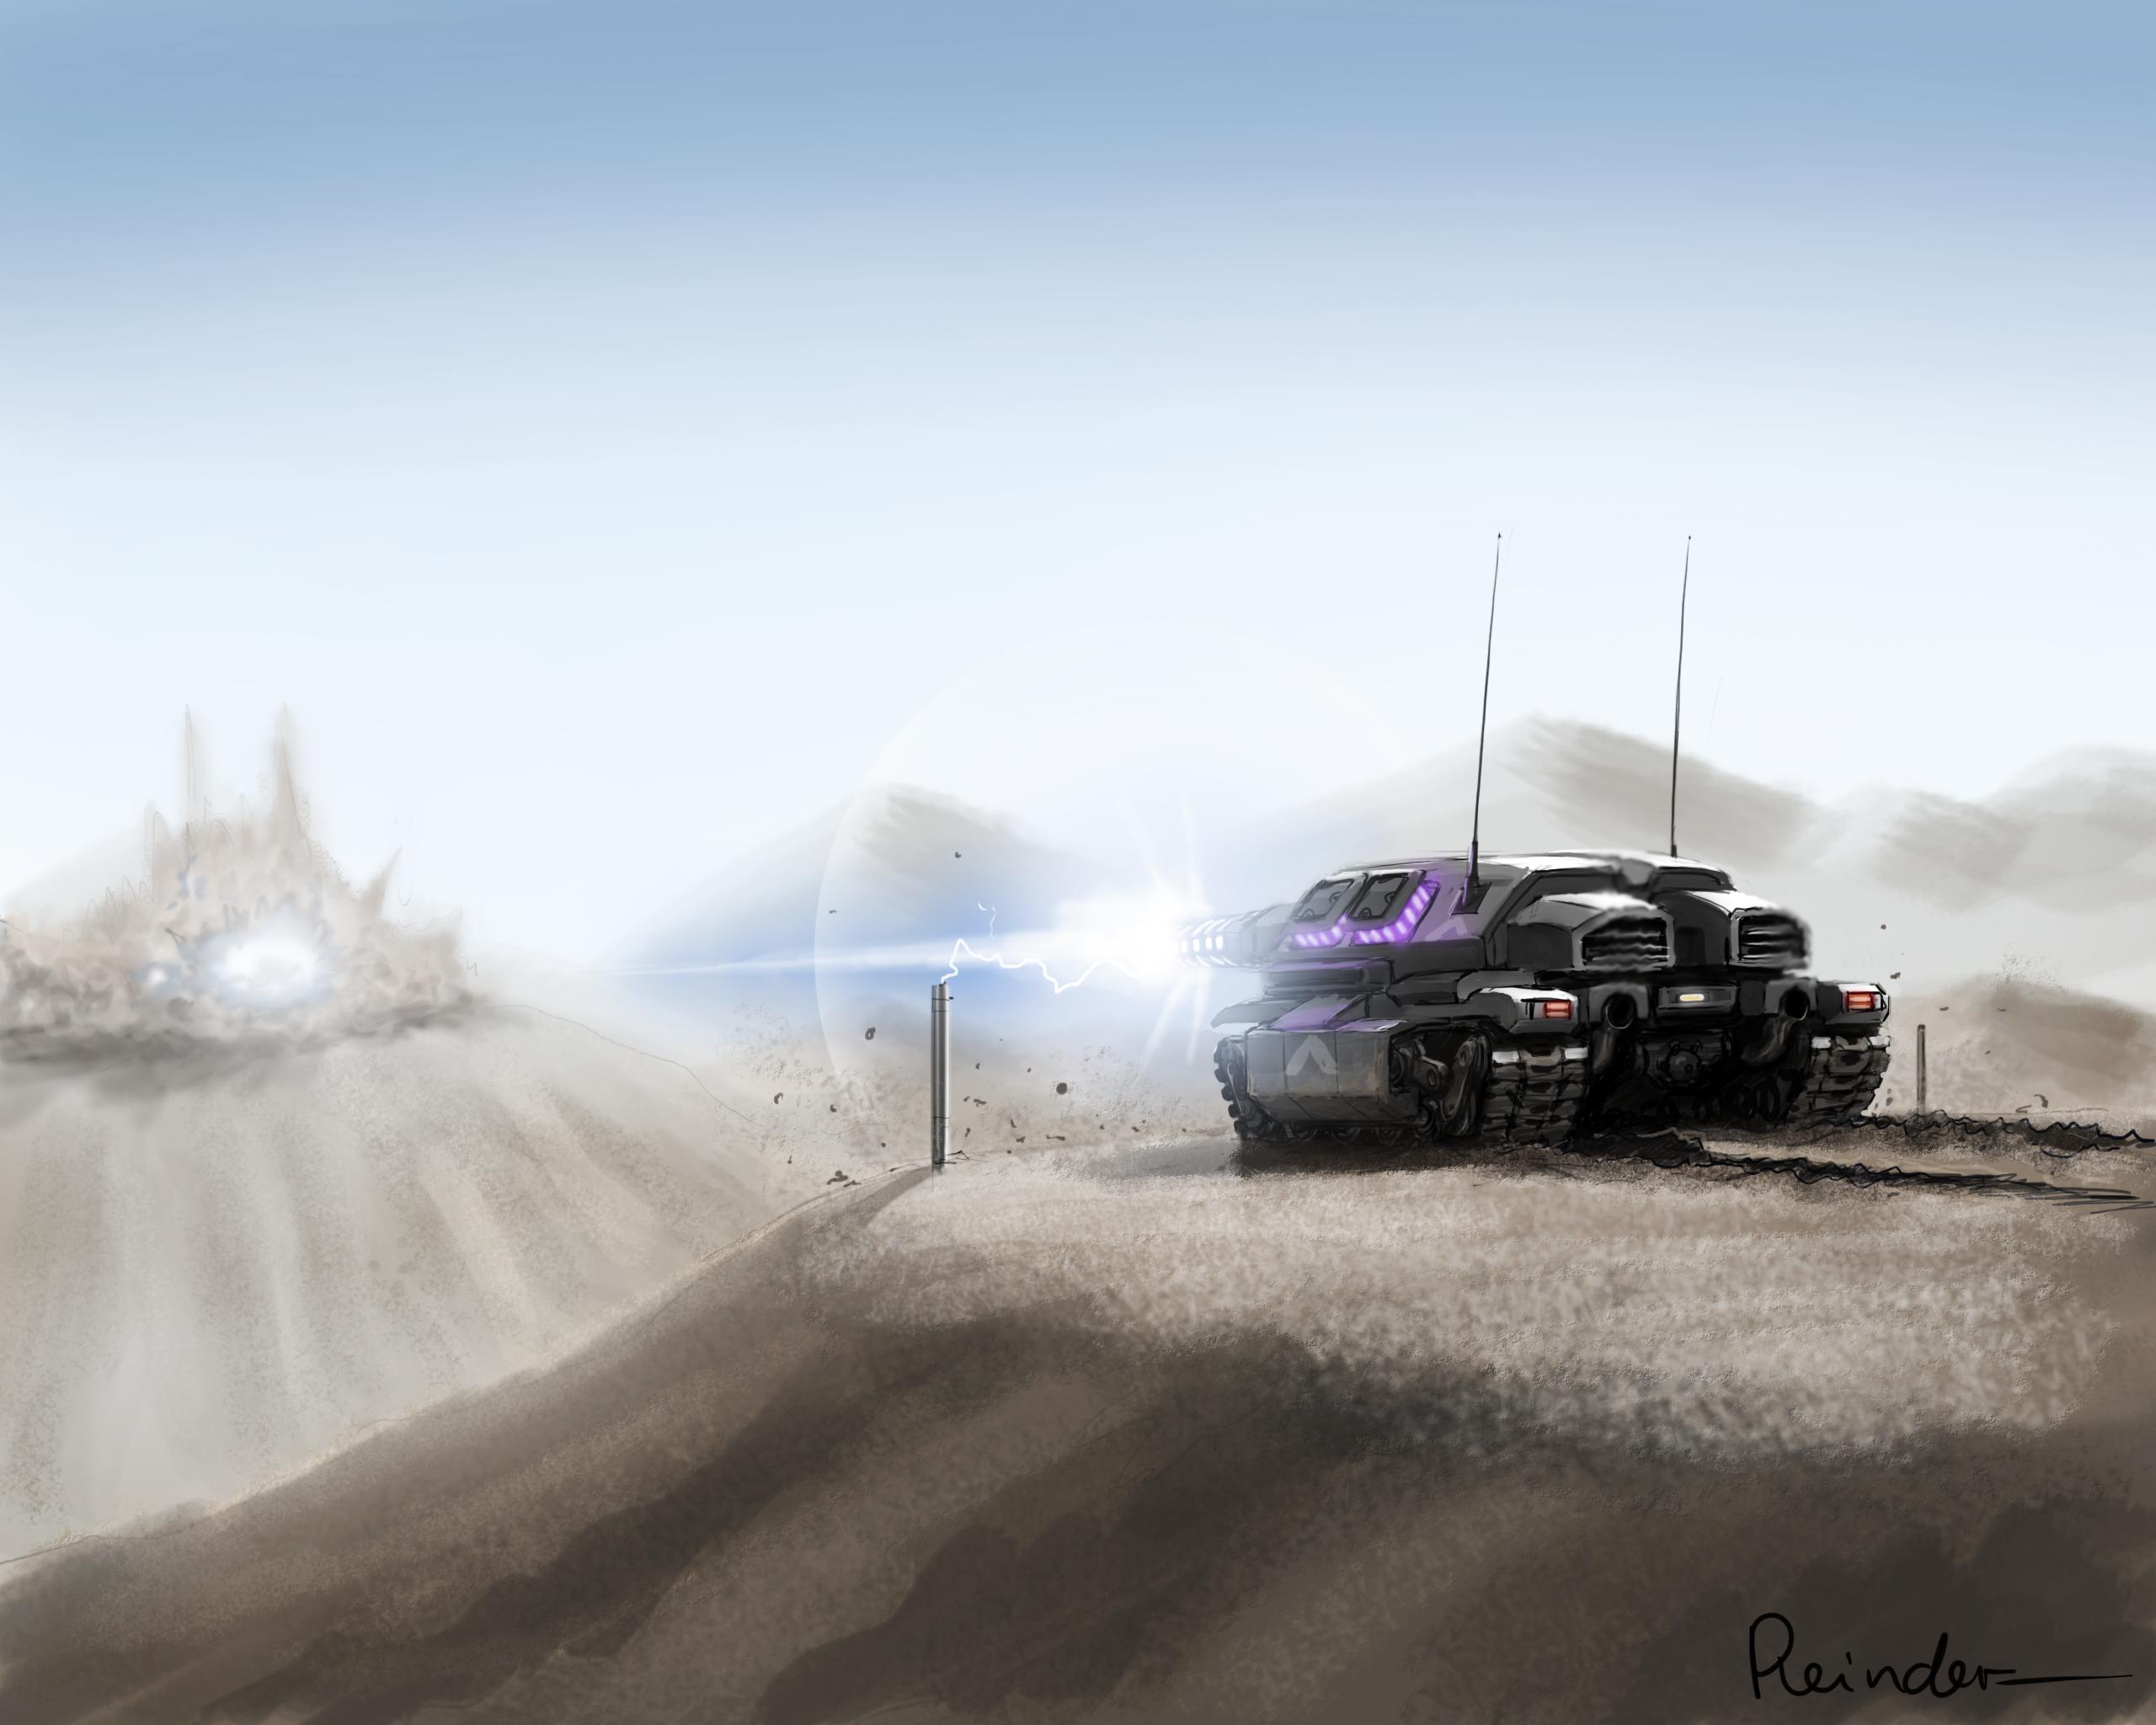 Railgun Artillery by Reinder : ImaginaryFutureWar